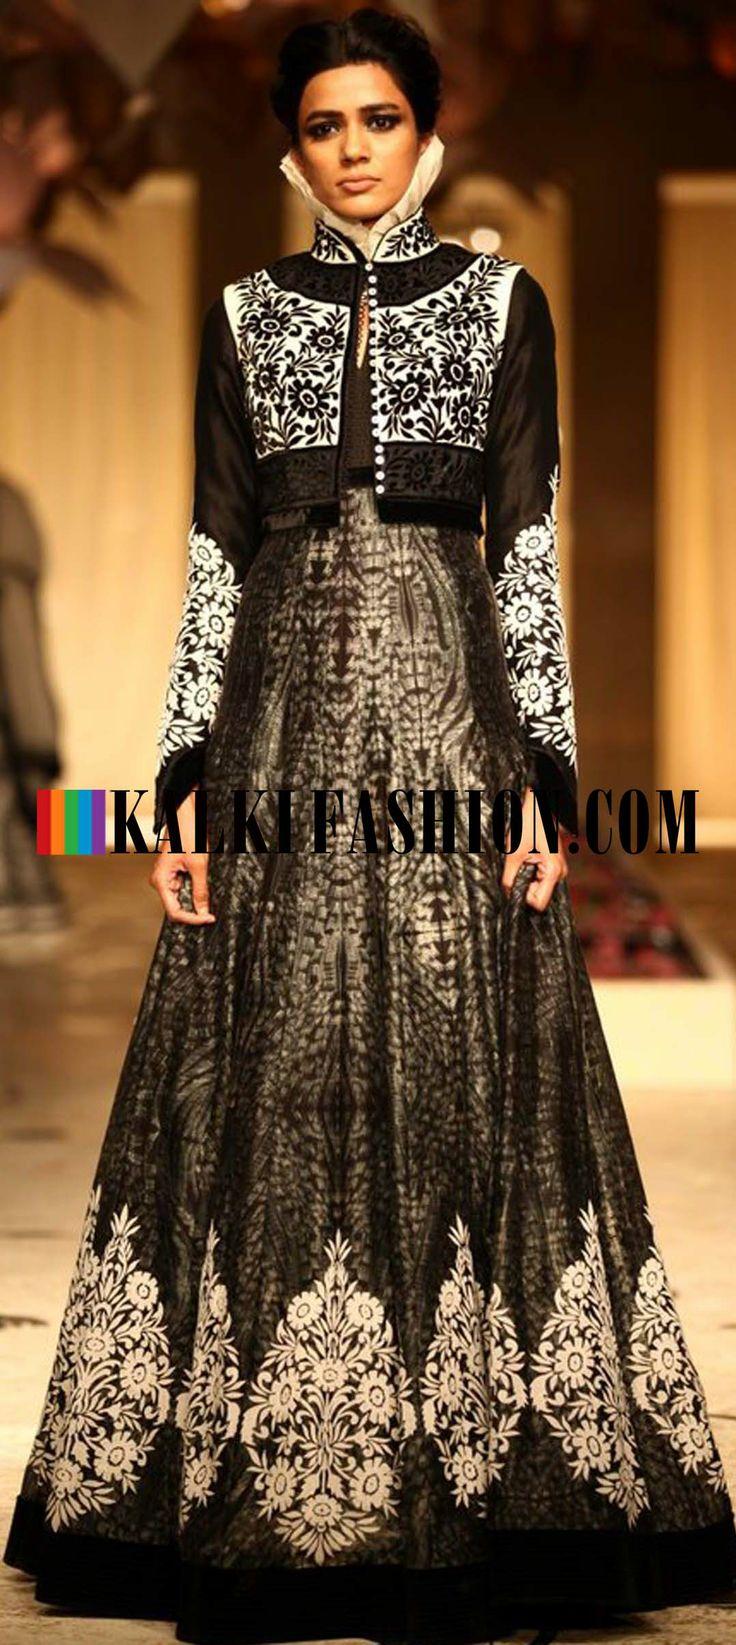 http://www.kalkifashion.com/designers/rohit-bal.htmlModels showcasing Rohit Bal's fabulous bridal and groom collection at Indian Bridal Fashion Week 2013 at Mumbai